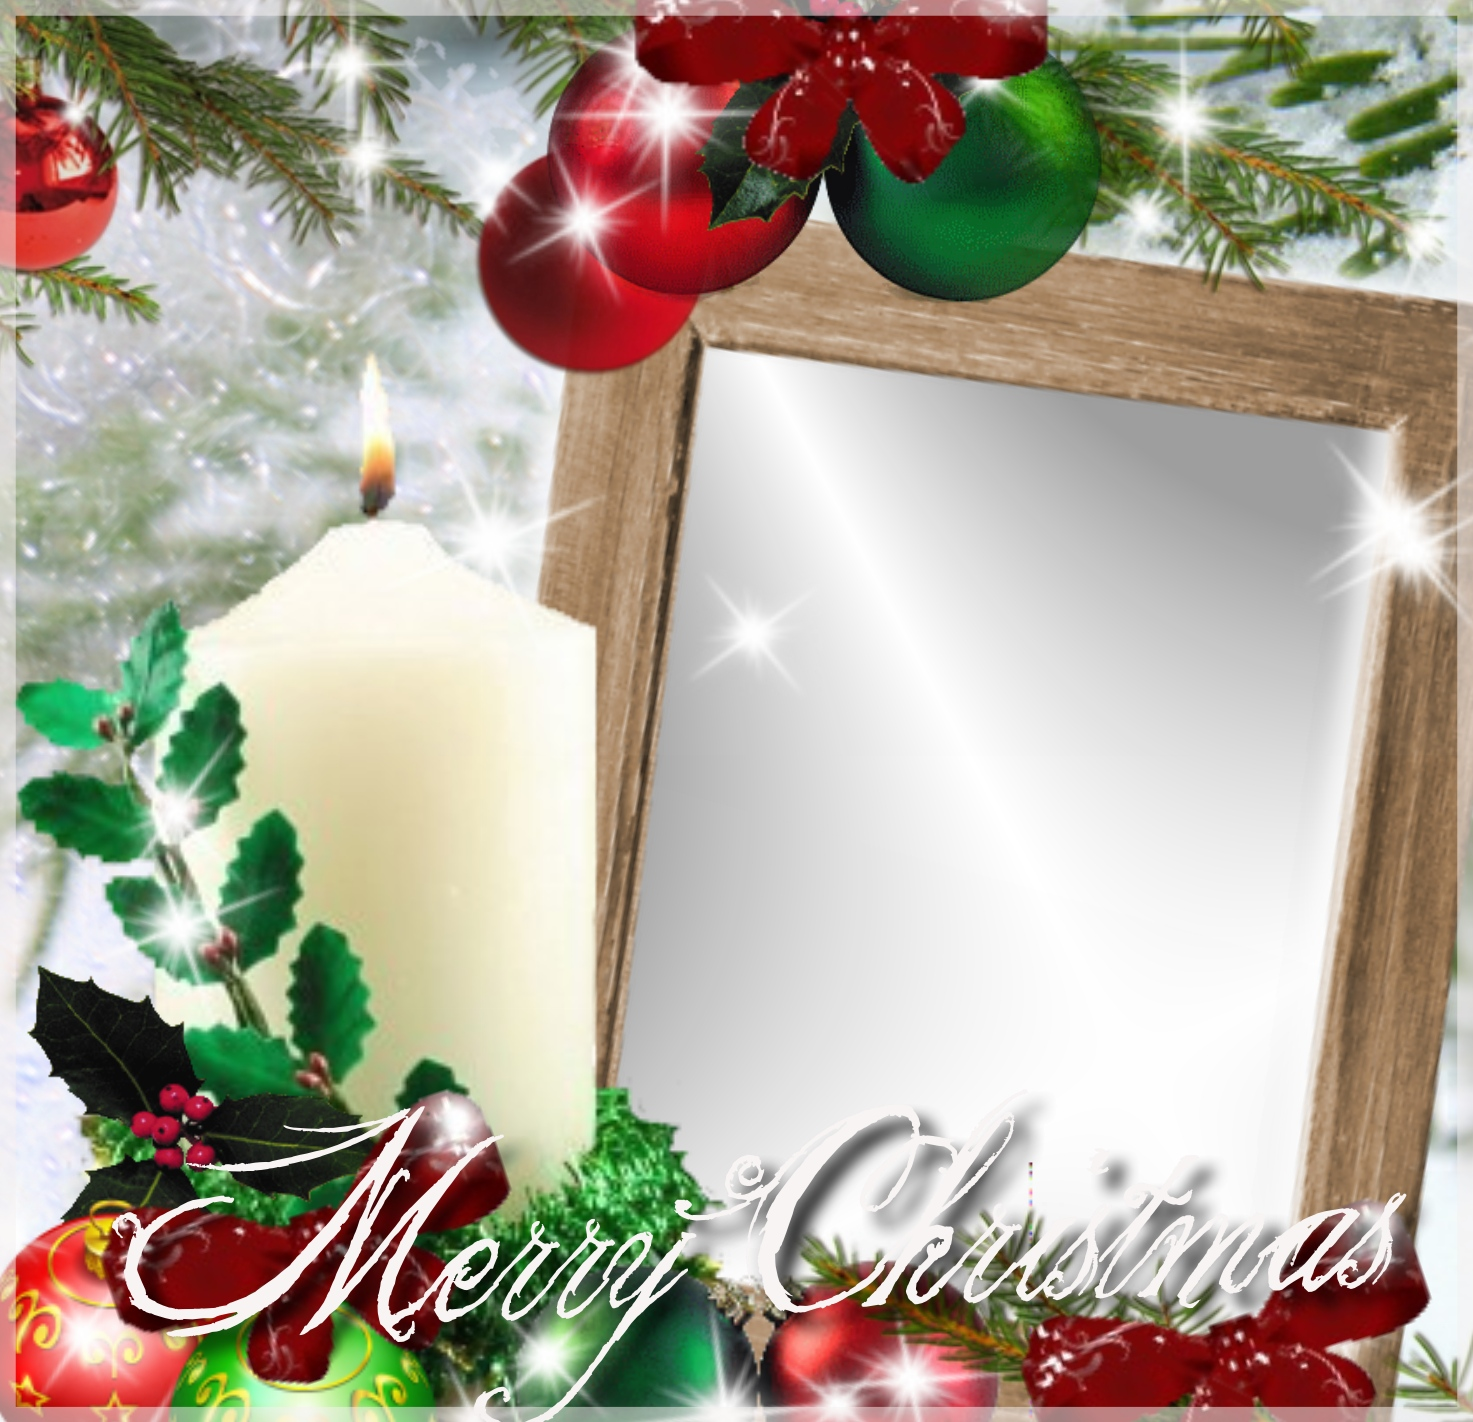 Imikimi Zo - New Hampshire Frames - merry christmas merry christmas ...